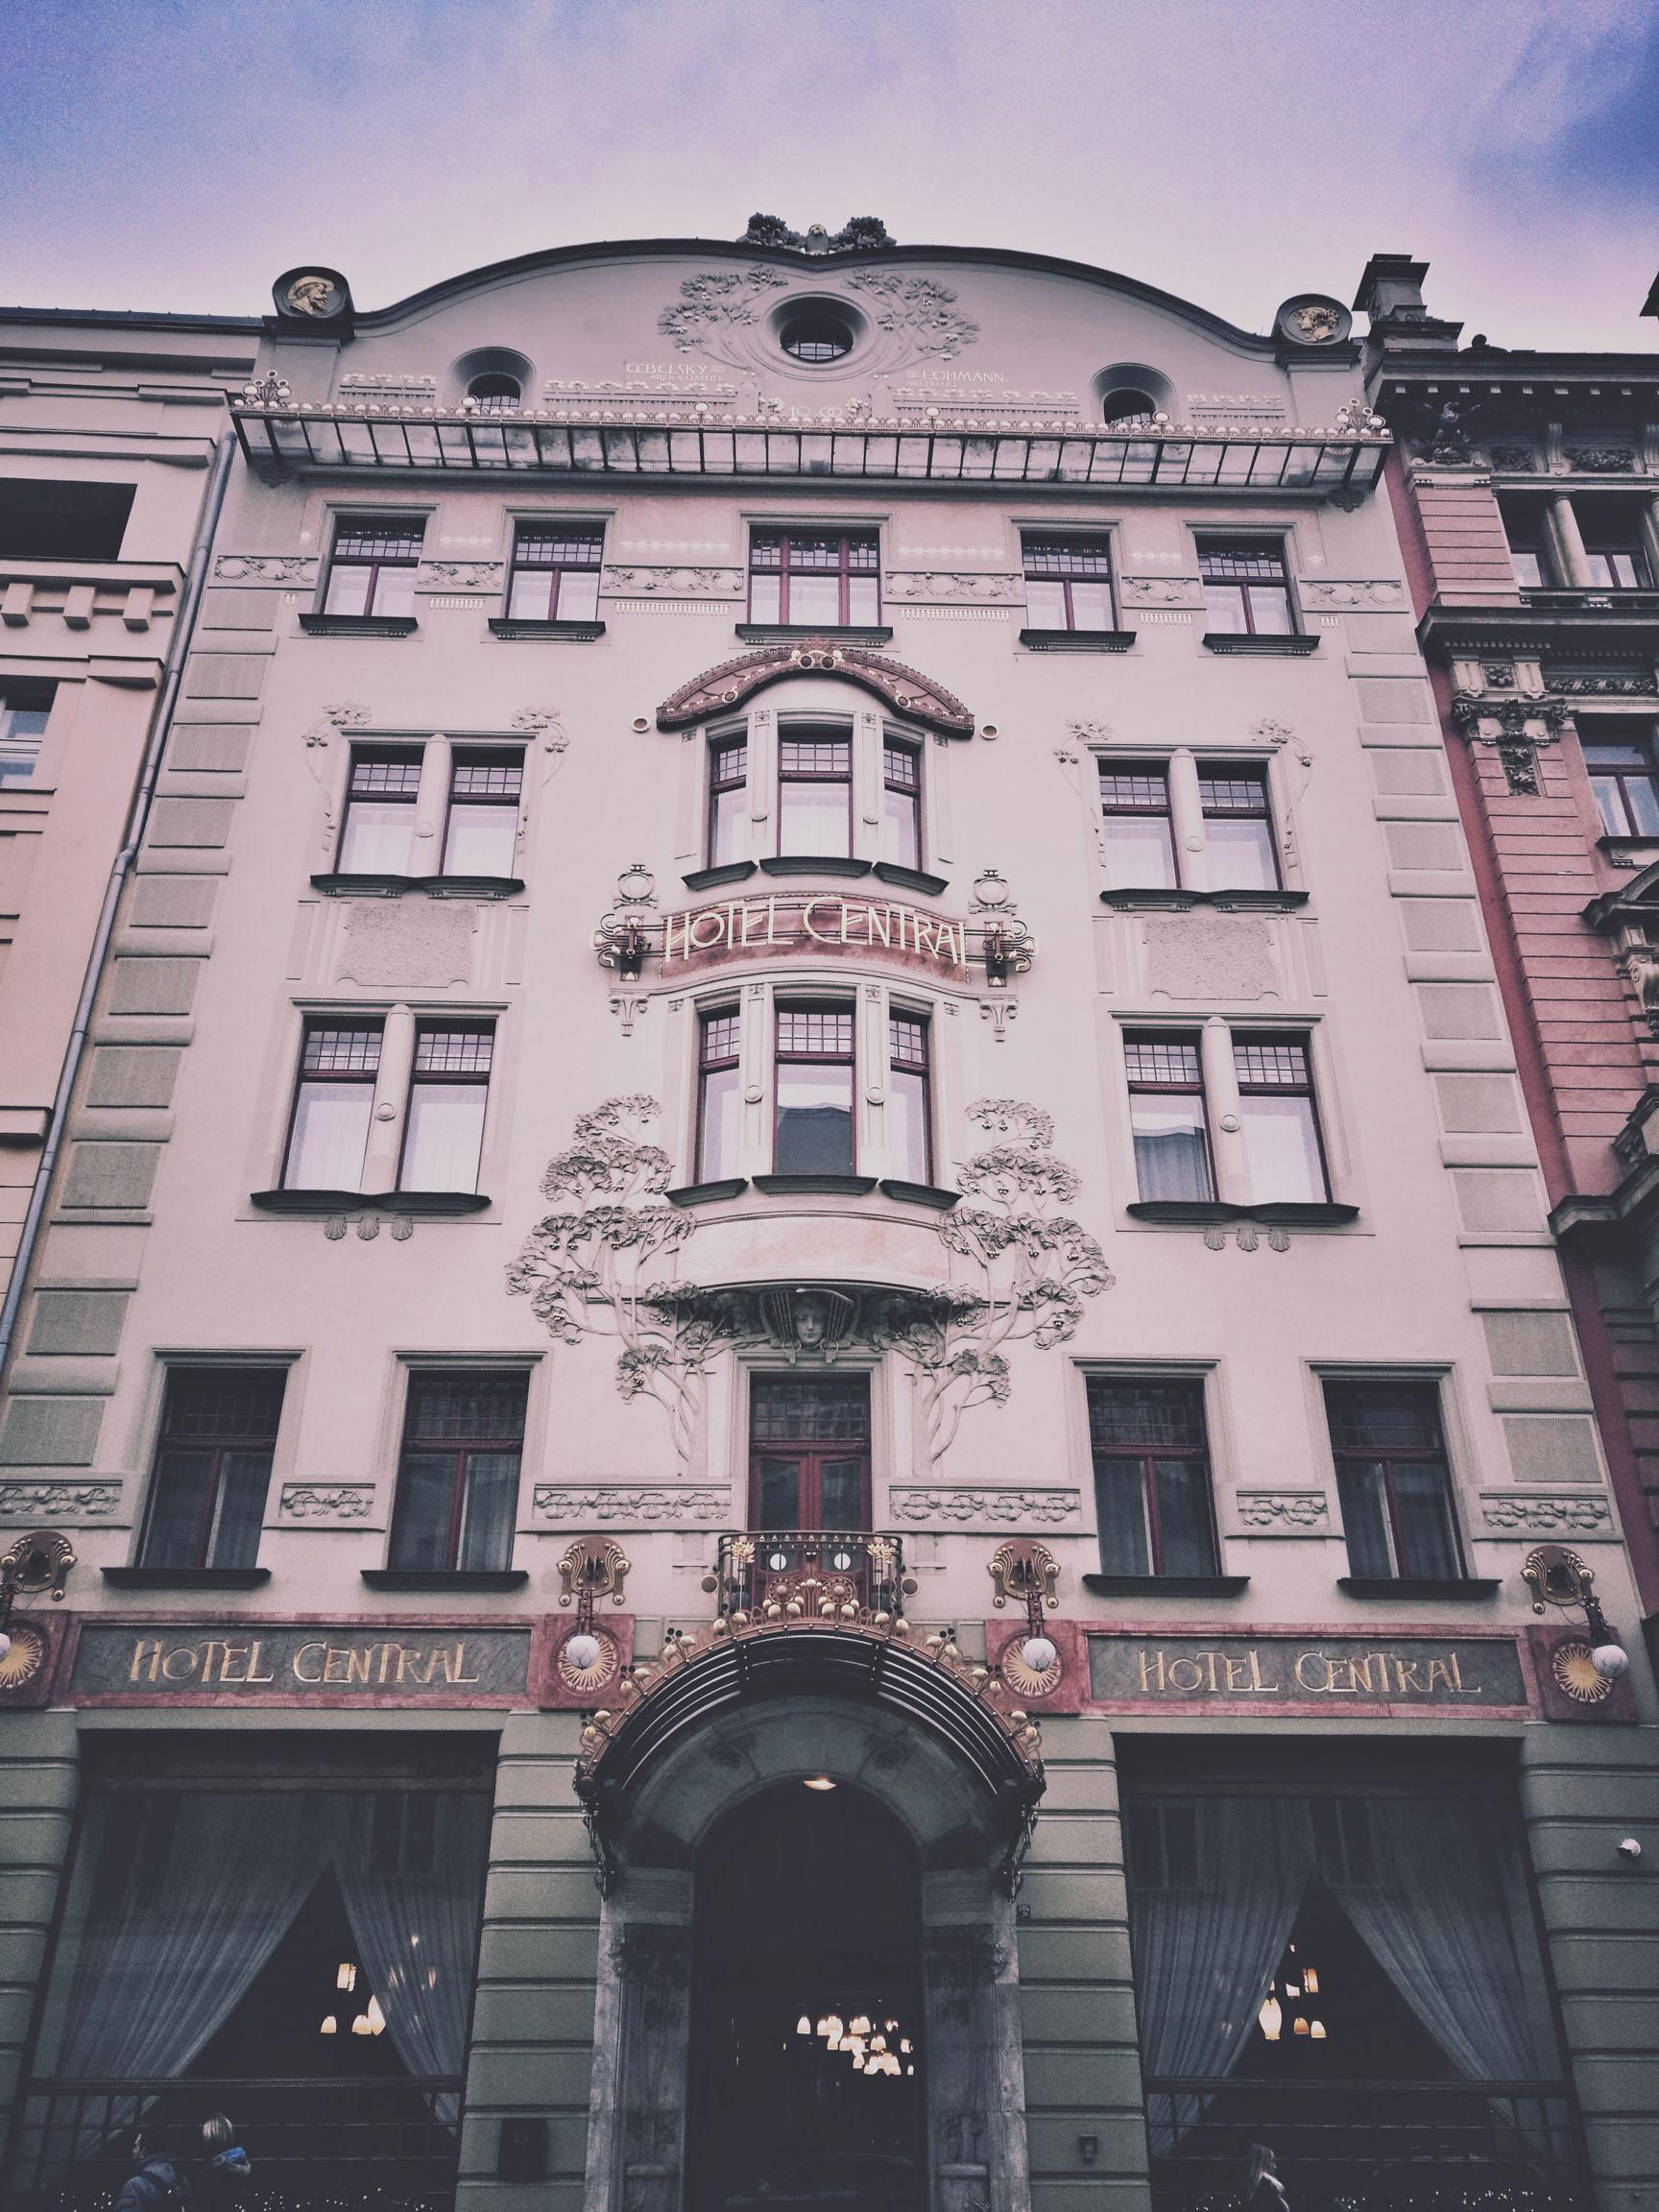 Blossom zine Praga in 4 giorni Art decò